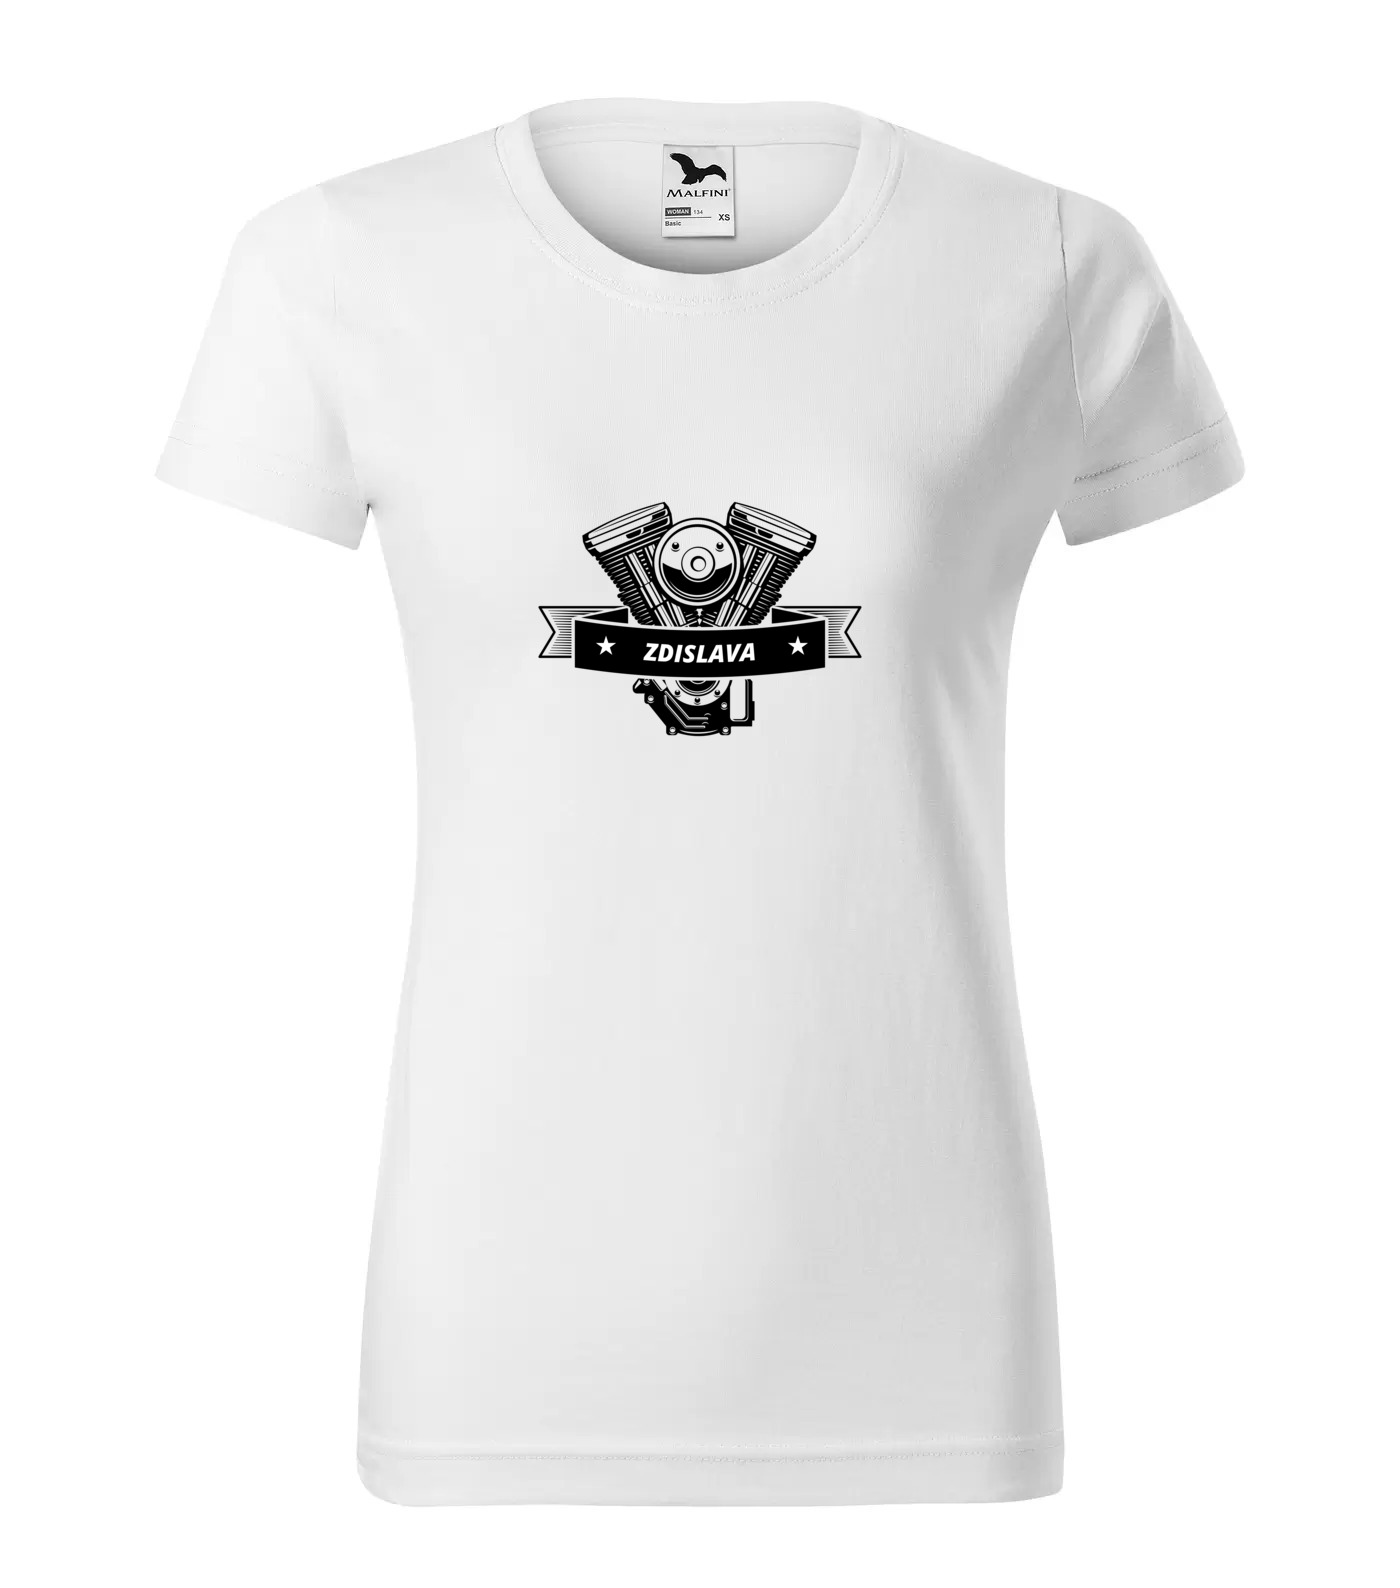 Tričko Motorkářka Zdislava